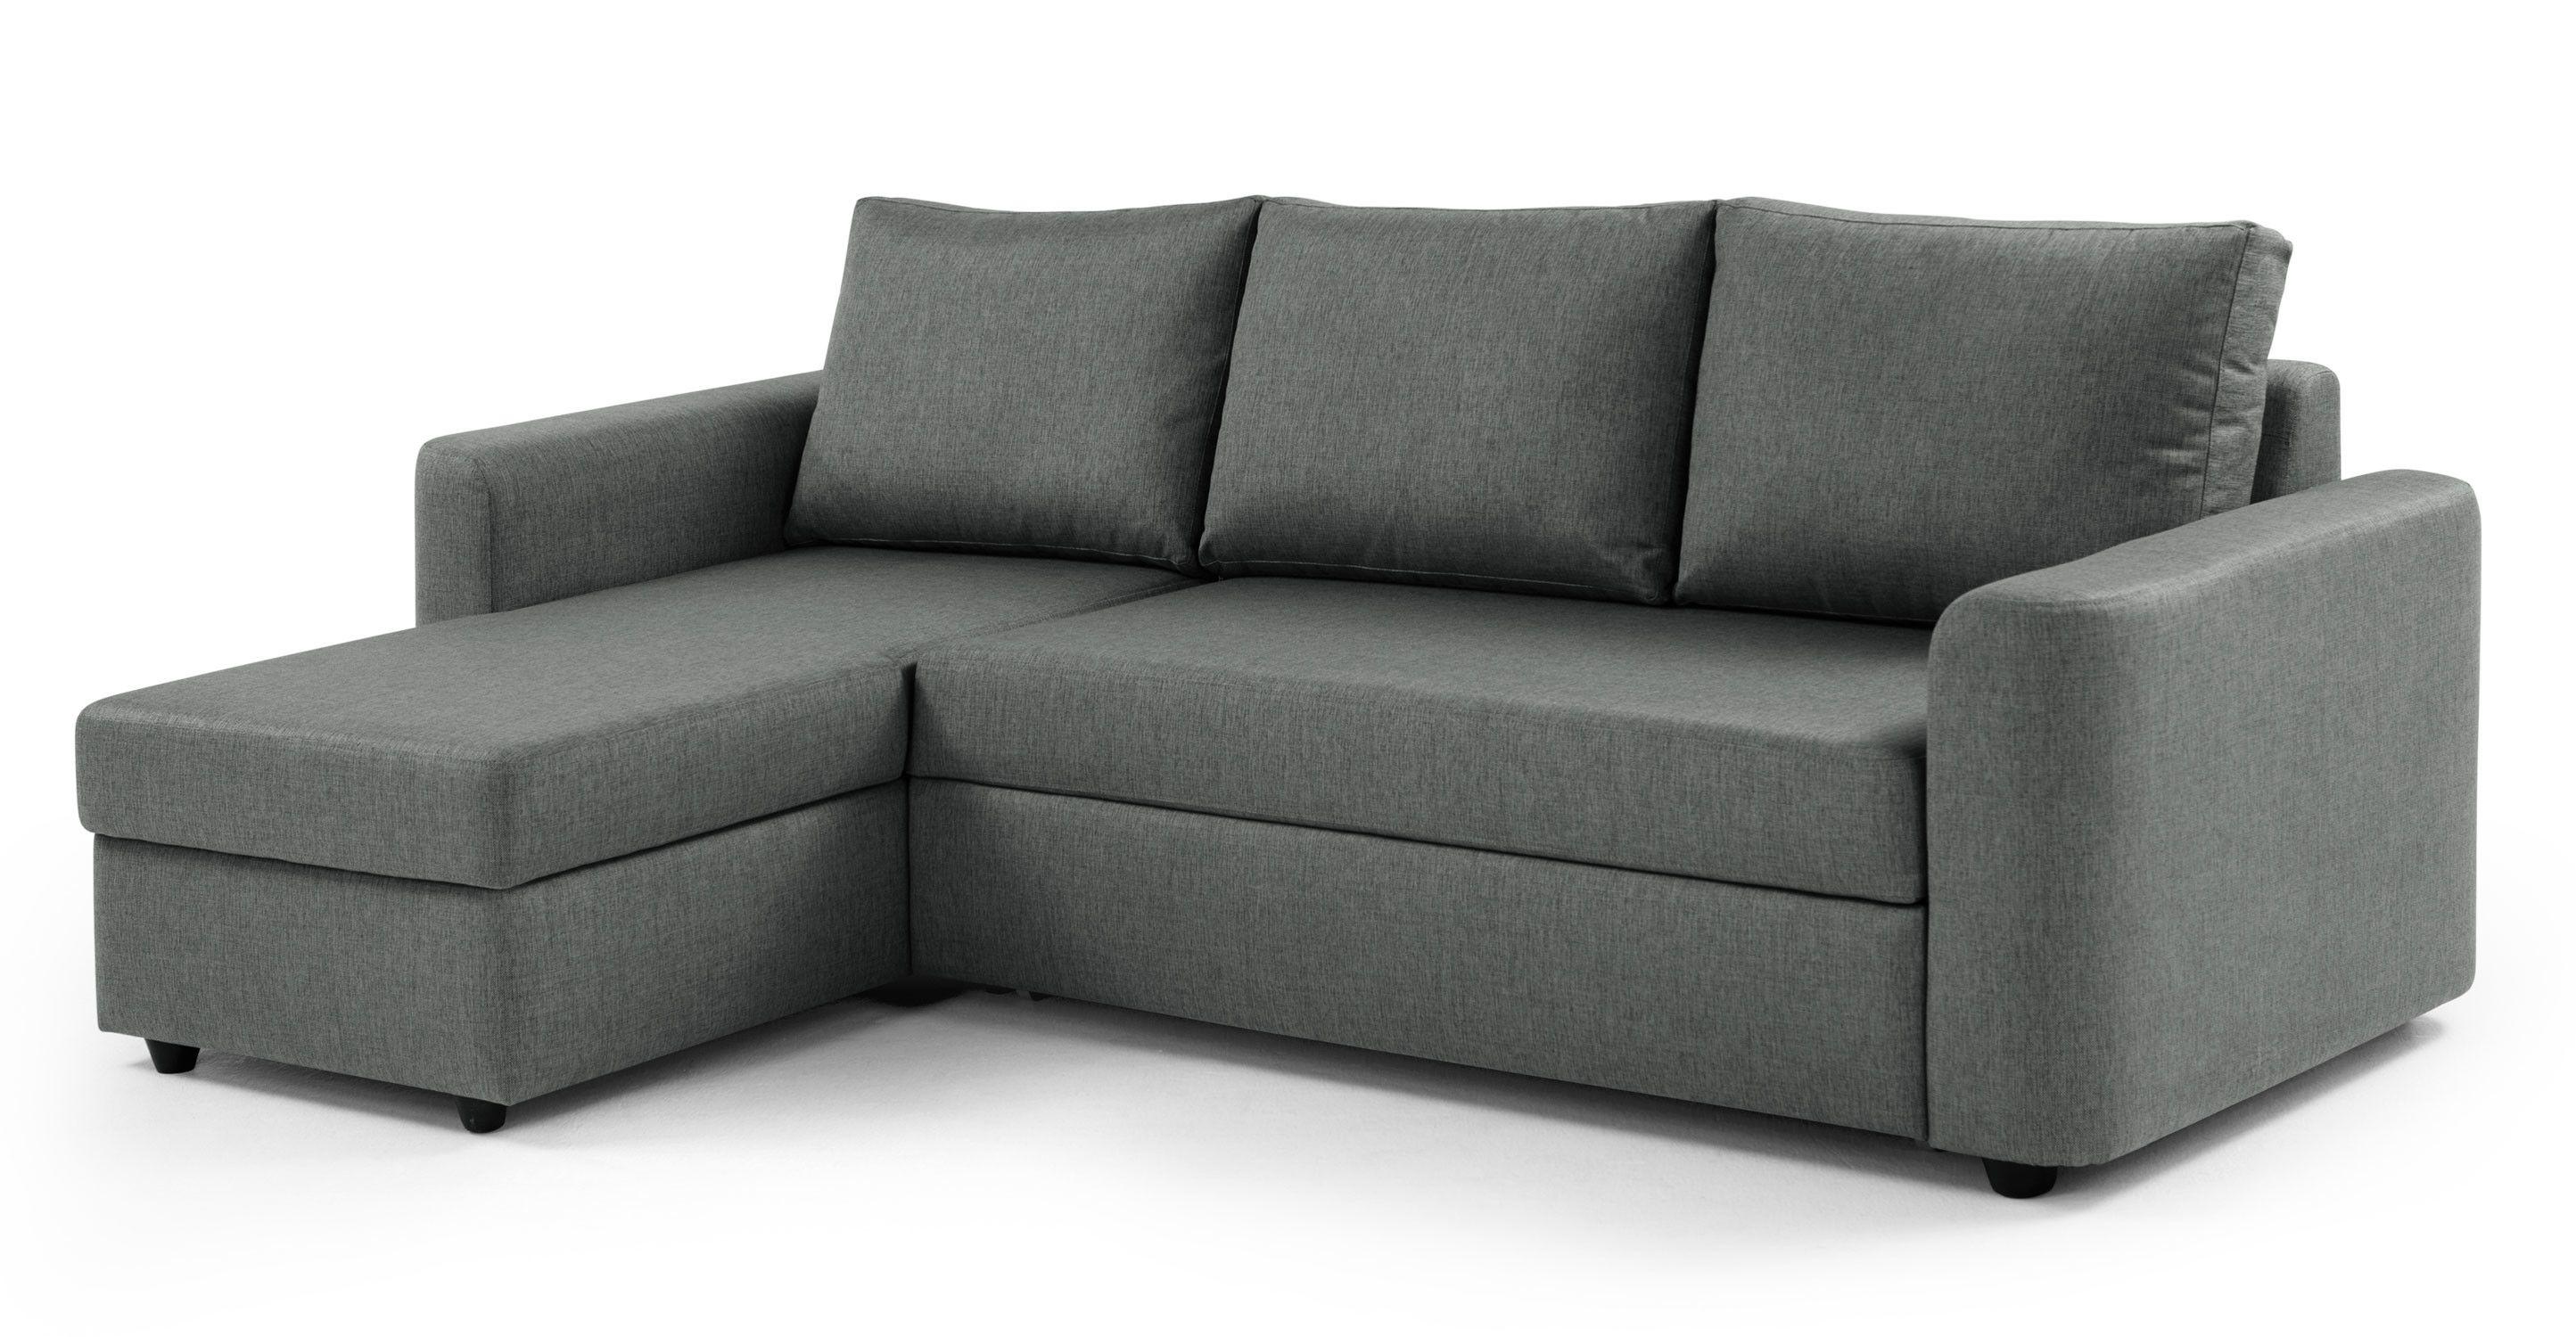 Albie Left Hand Facing Corner Storage Sofa Bed Charcol Grey Made Com Sofa Bed With Chaise Corner Storage Sofa